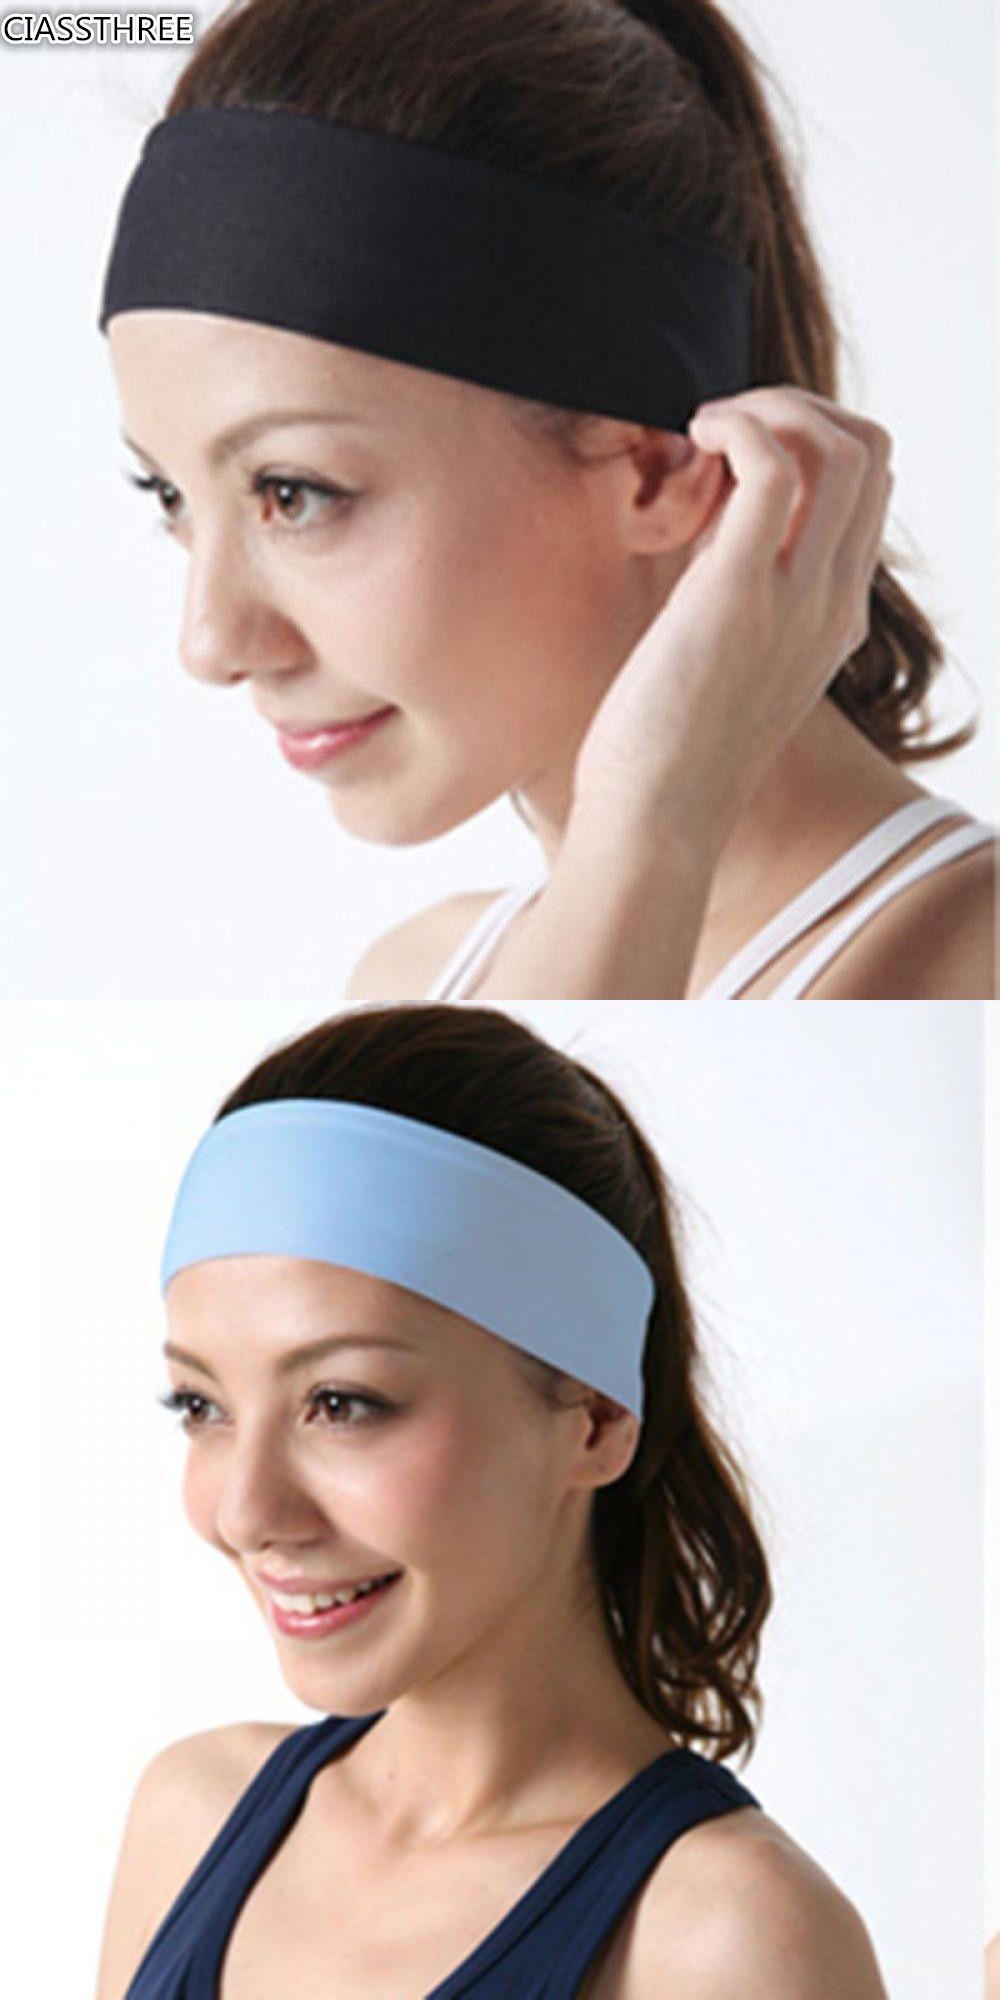 100% Cotton Women Men Thick Tower Sports Headband Tennis Badminton  Basketball Sweatband Head Band Yoga 851b3a758a7